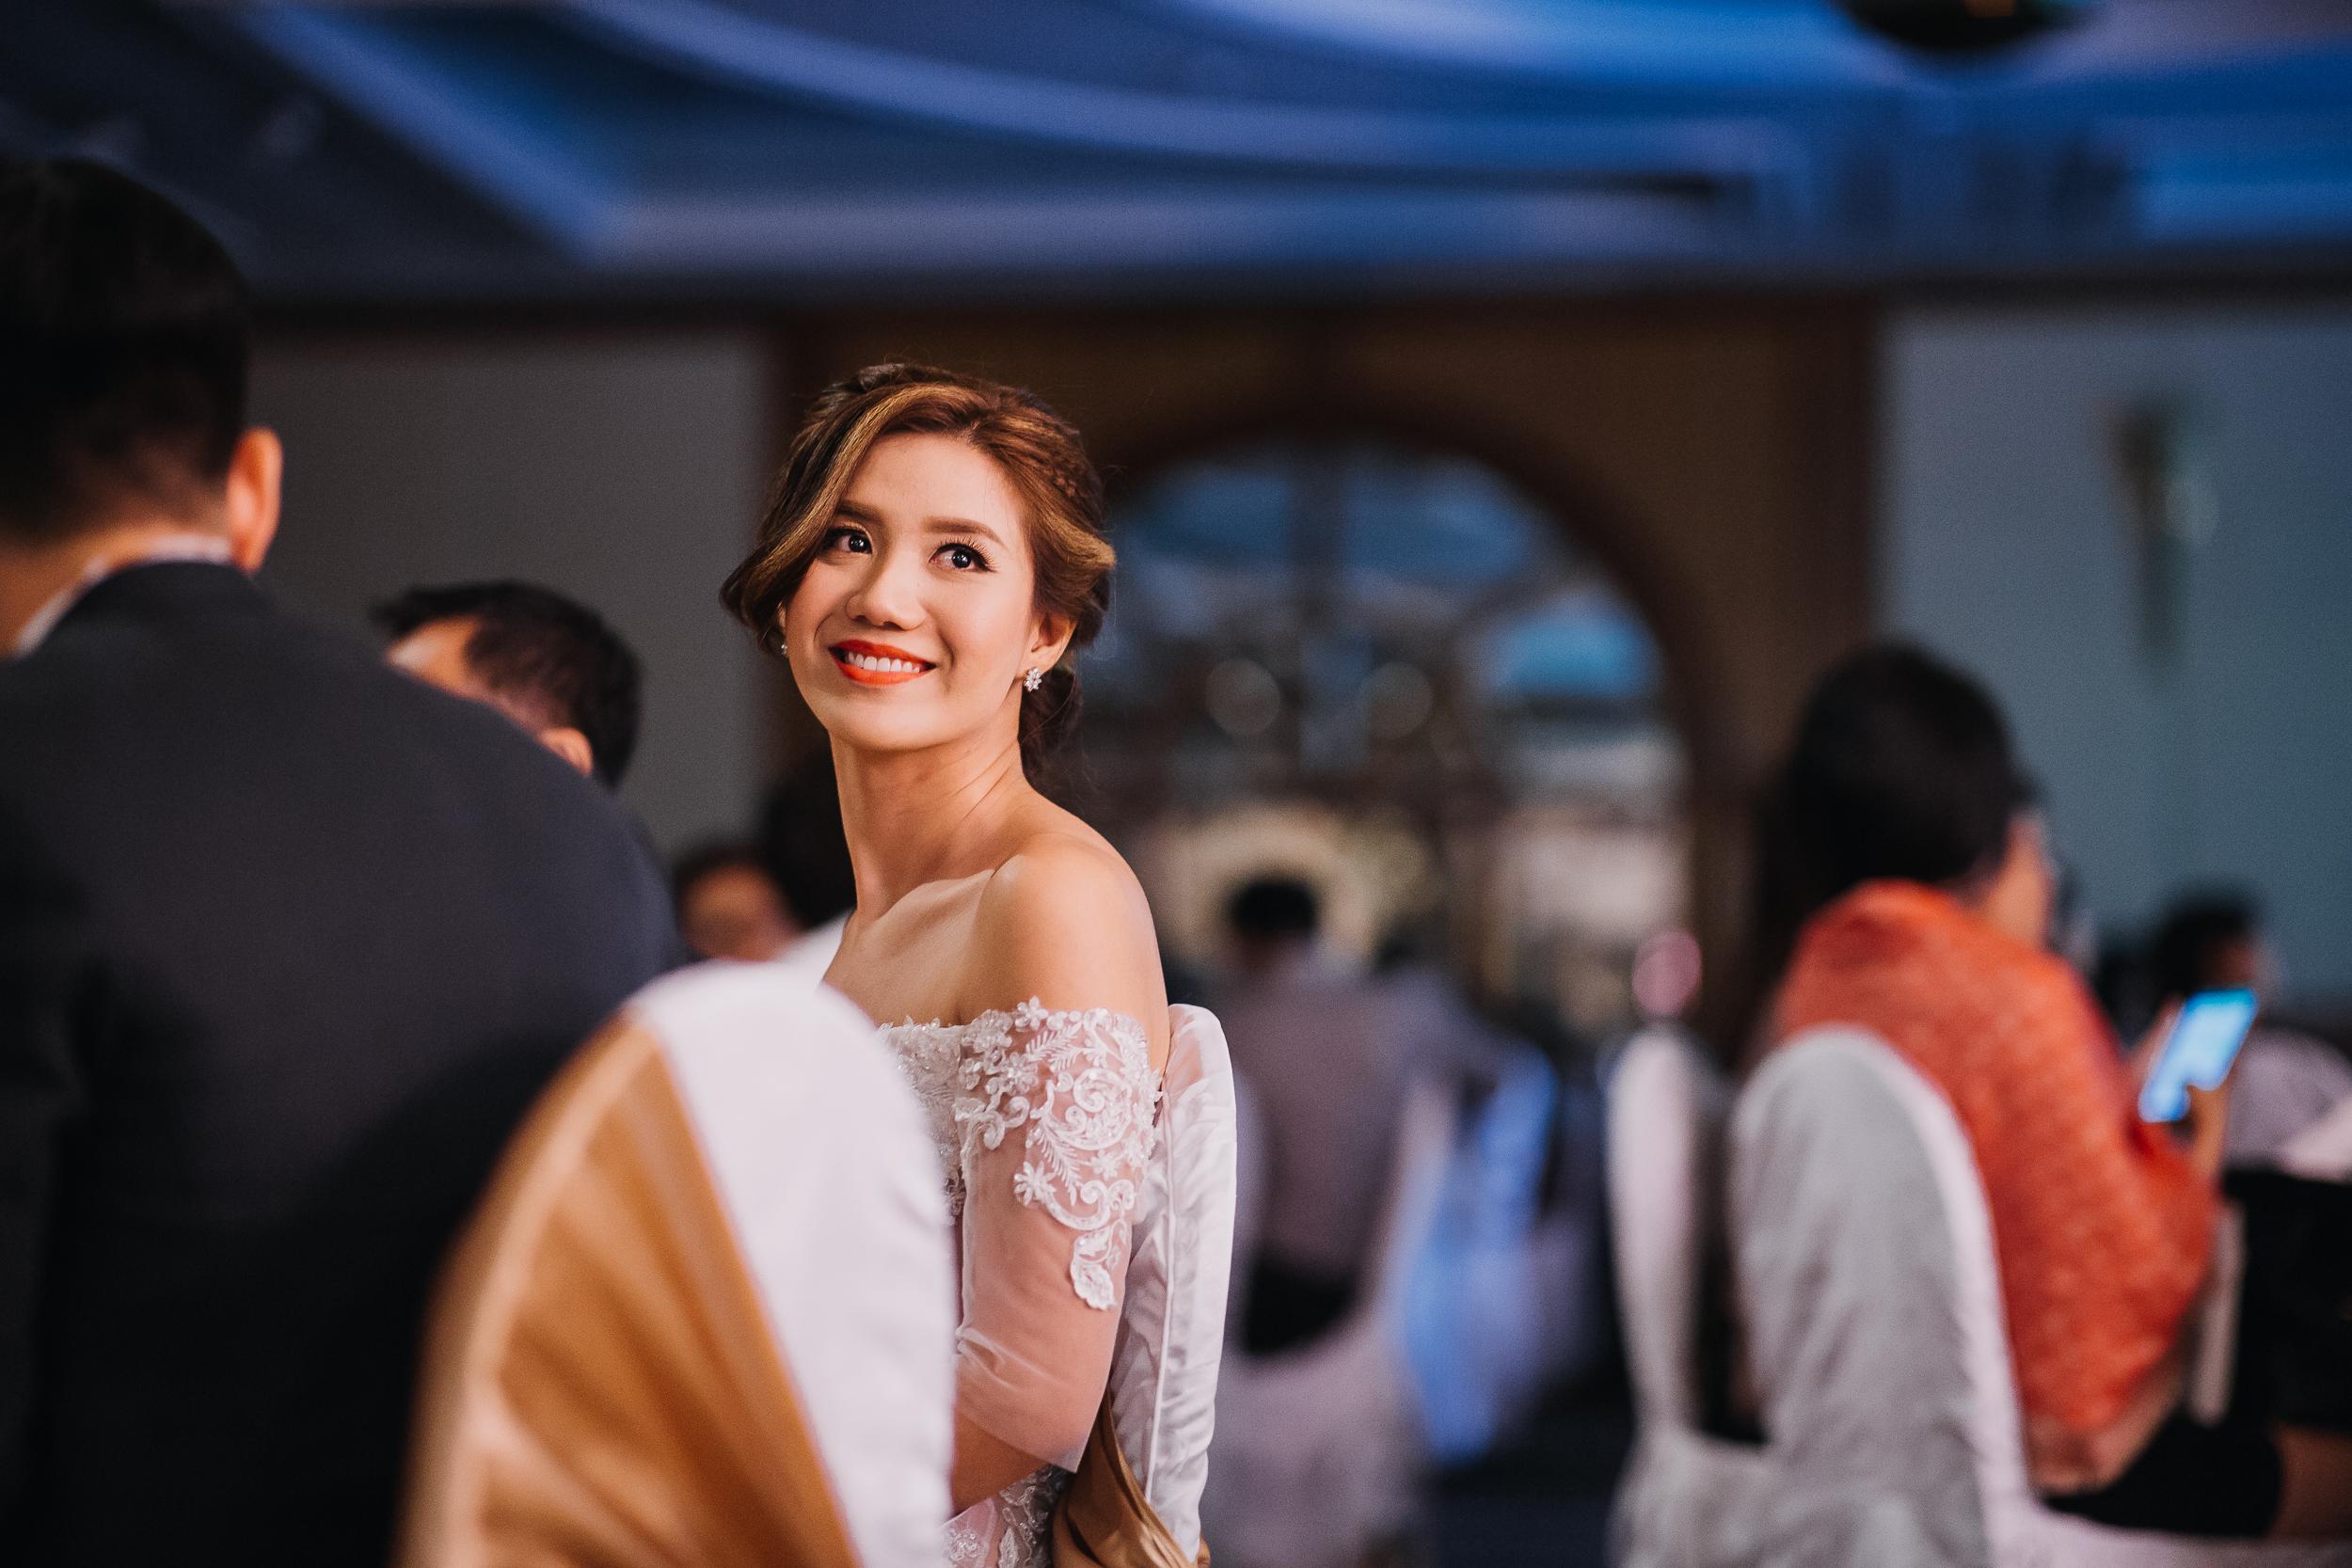 Singapore+Actual+Day+Wedding+Photographer+Raffles+Town+Club+Jeremiah+Christina-0079.jpg